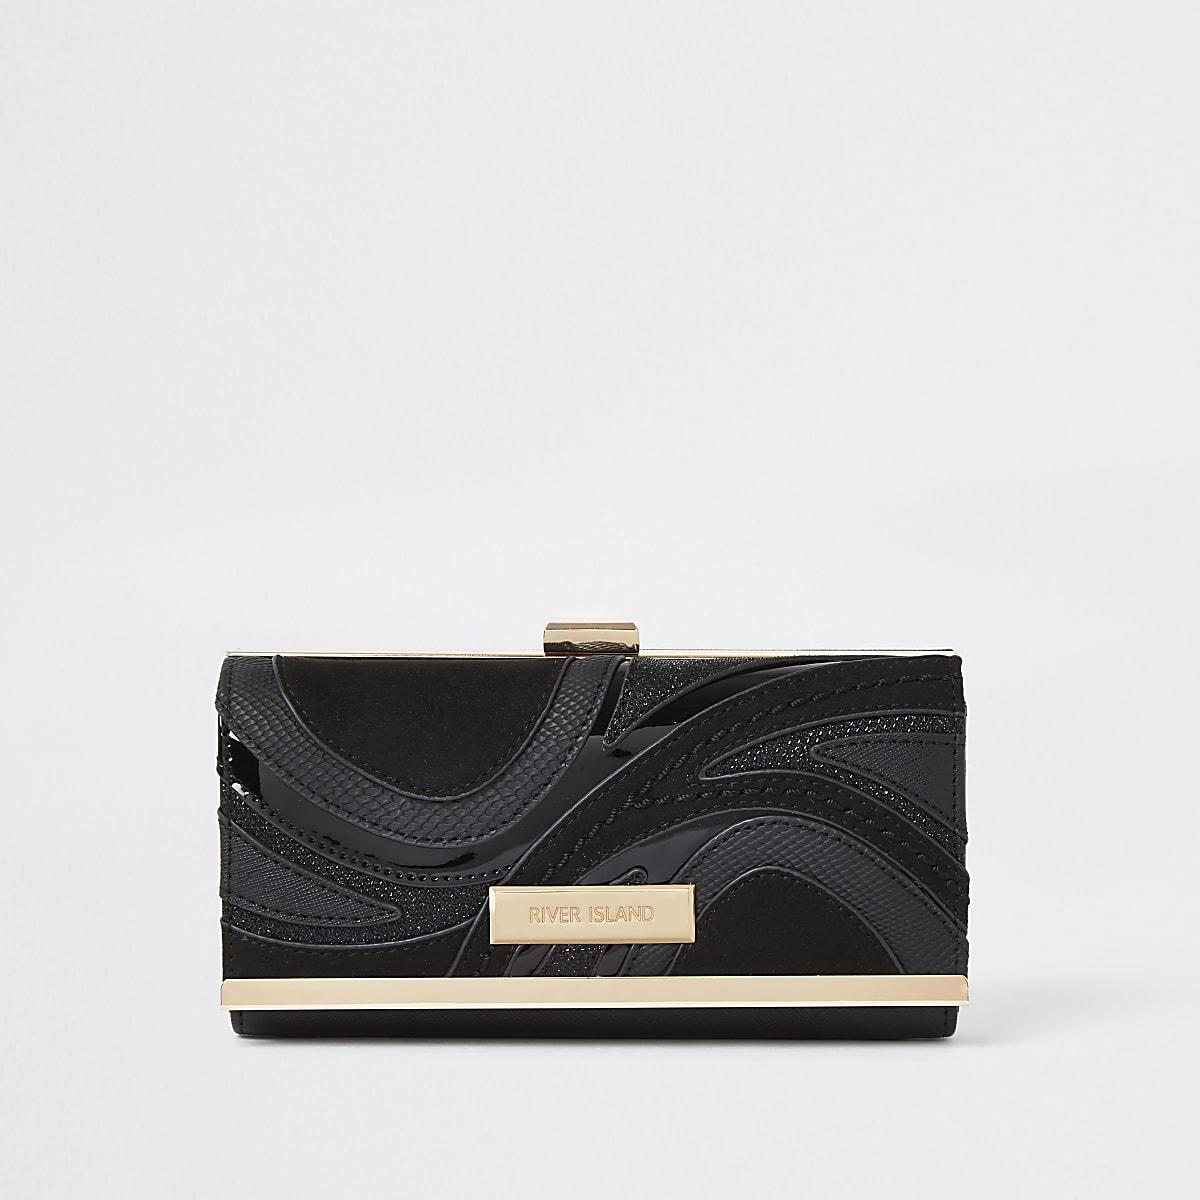 Zwarte portemonnee met druksluiting, wervelprint en uitsnede